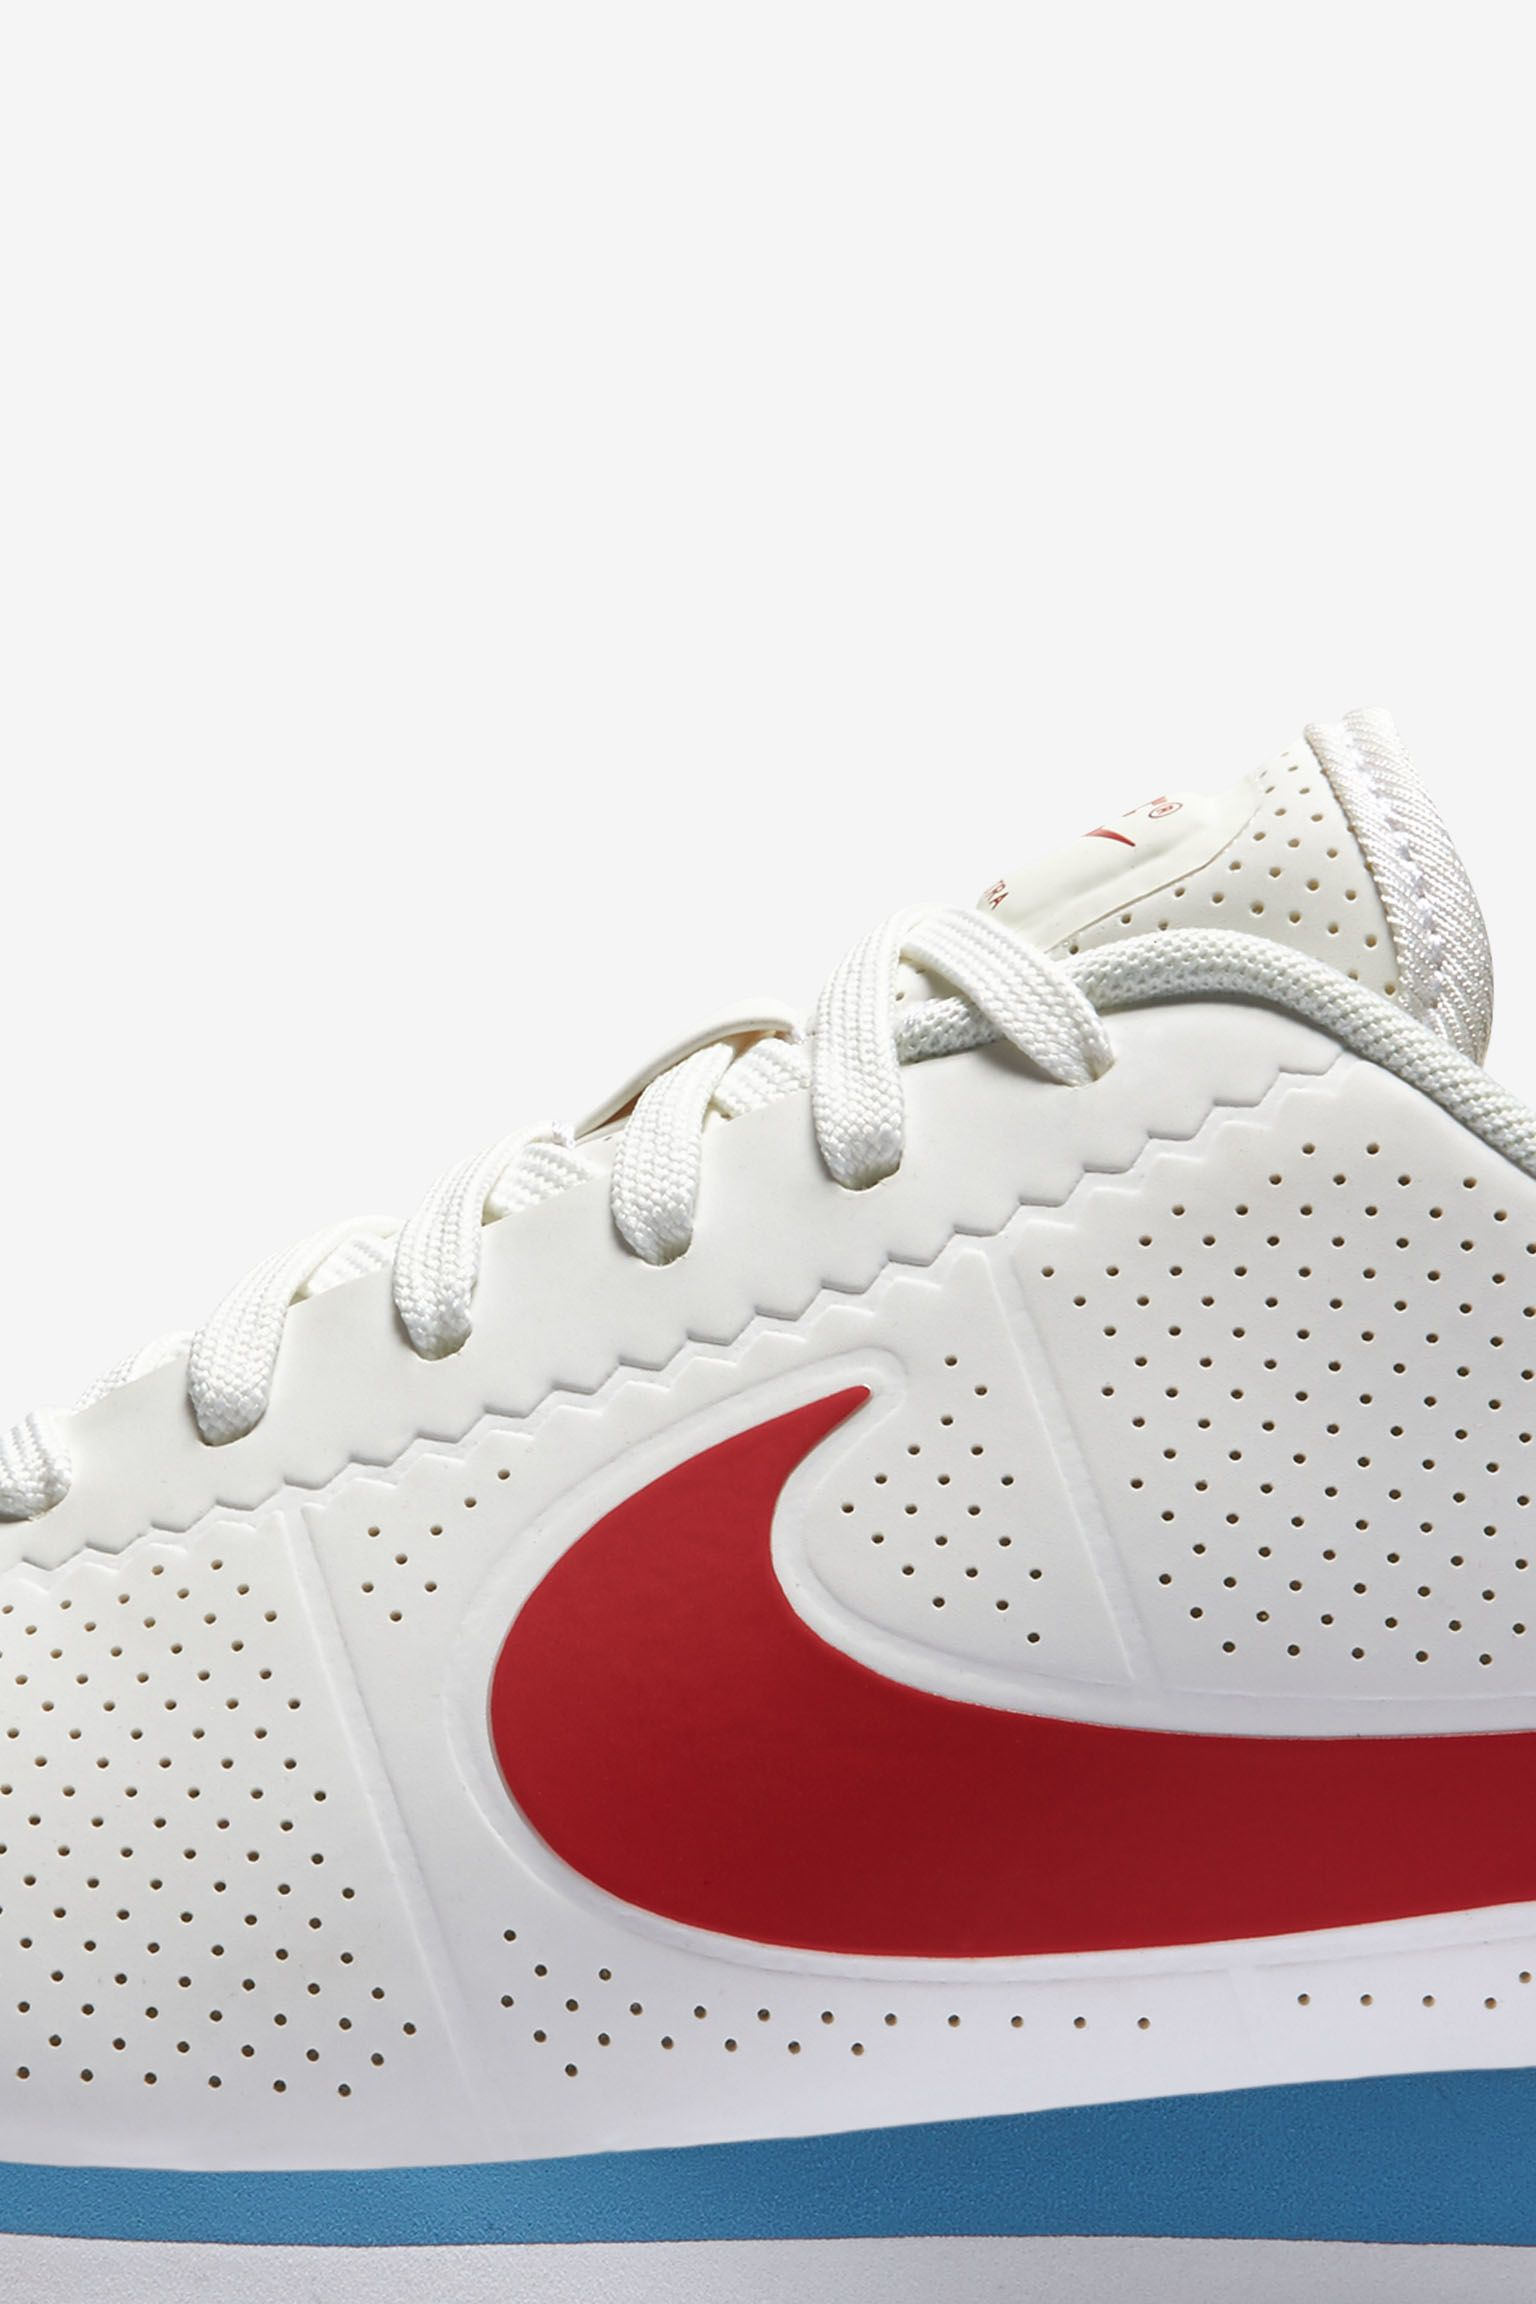 Women's Nike Cortez Ultra Moire 'White, Varsity Red & Blue' Release Date